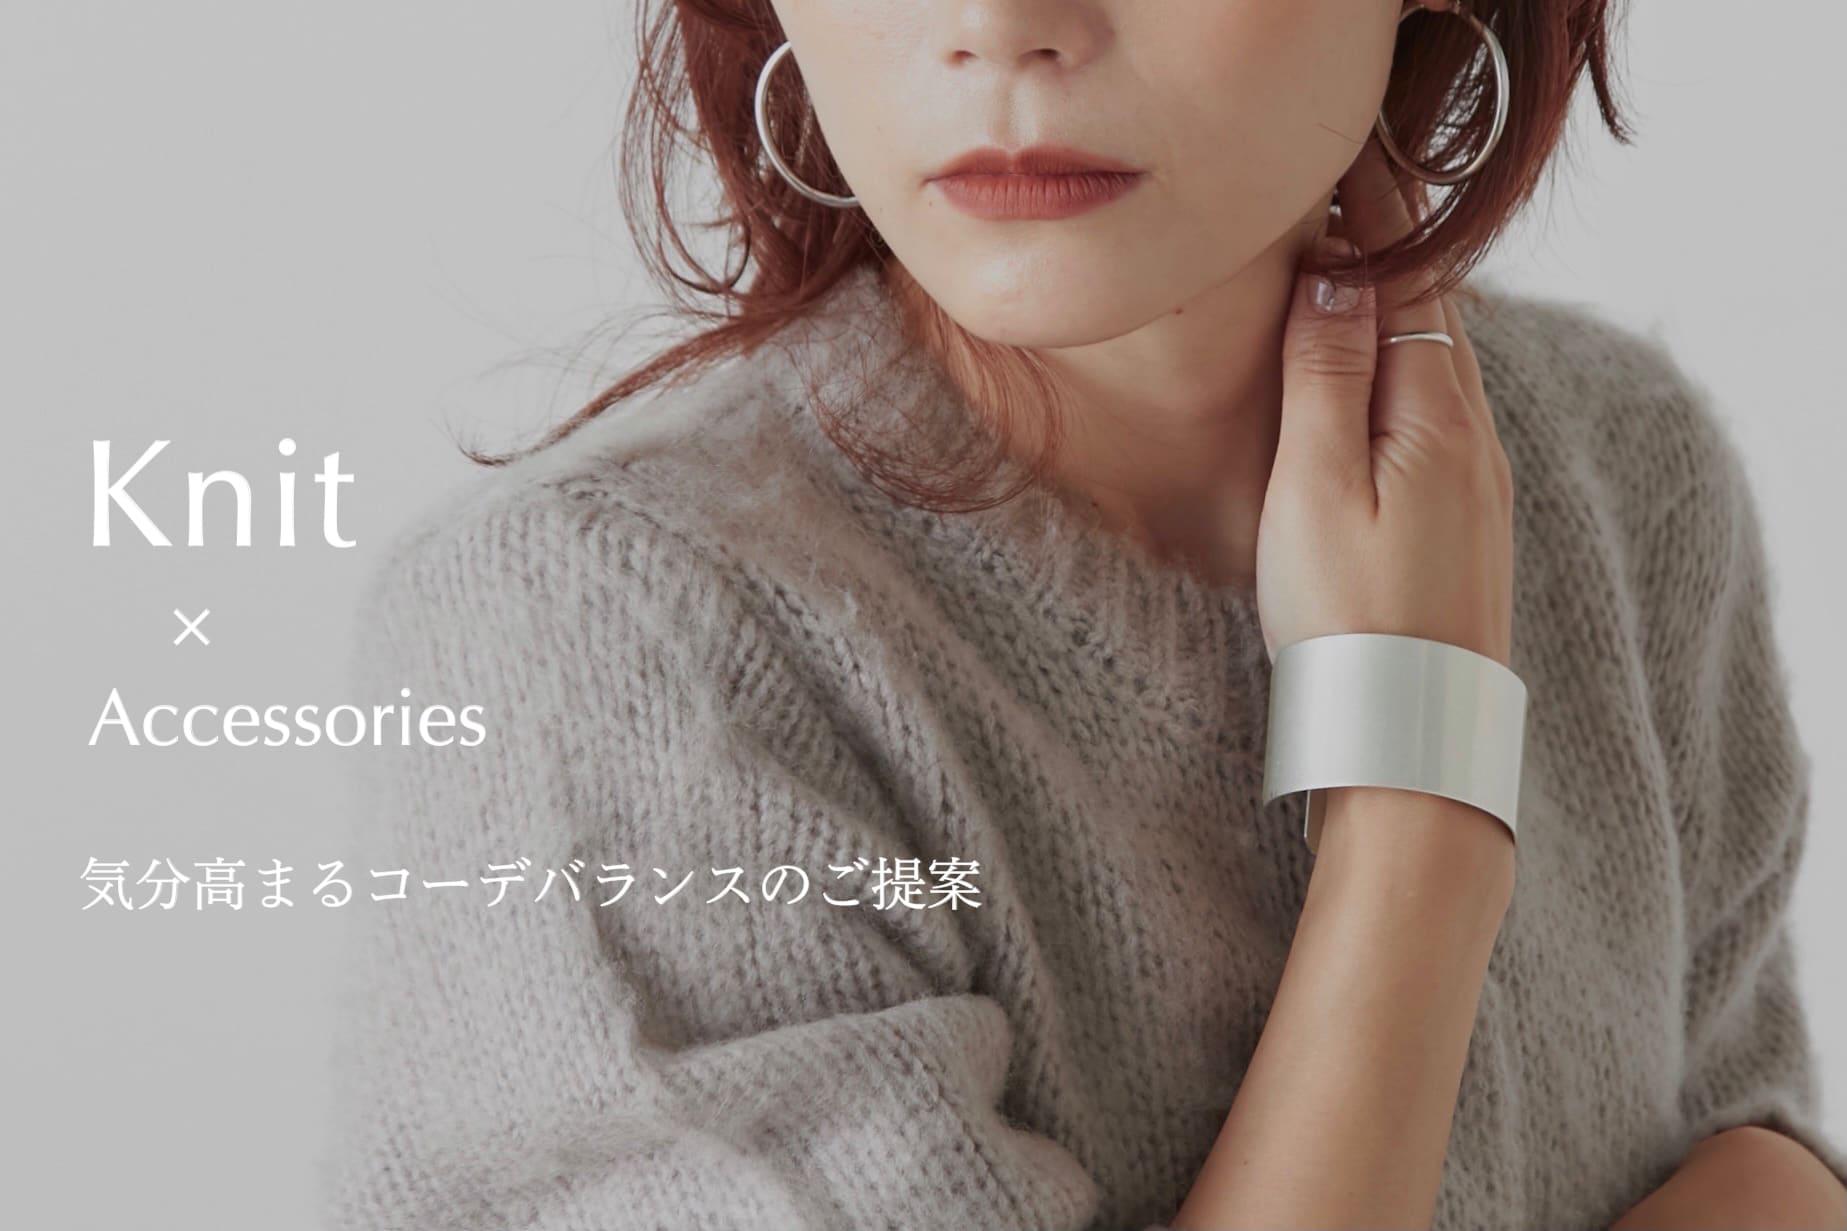 Omekashi Knit × Accessories